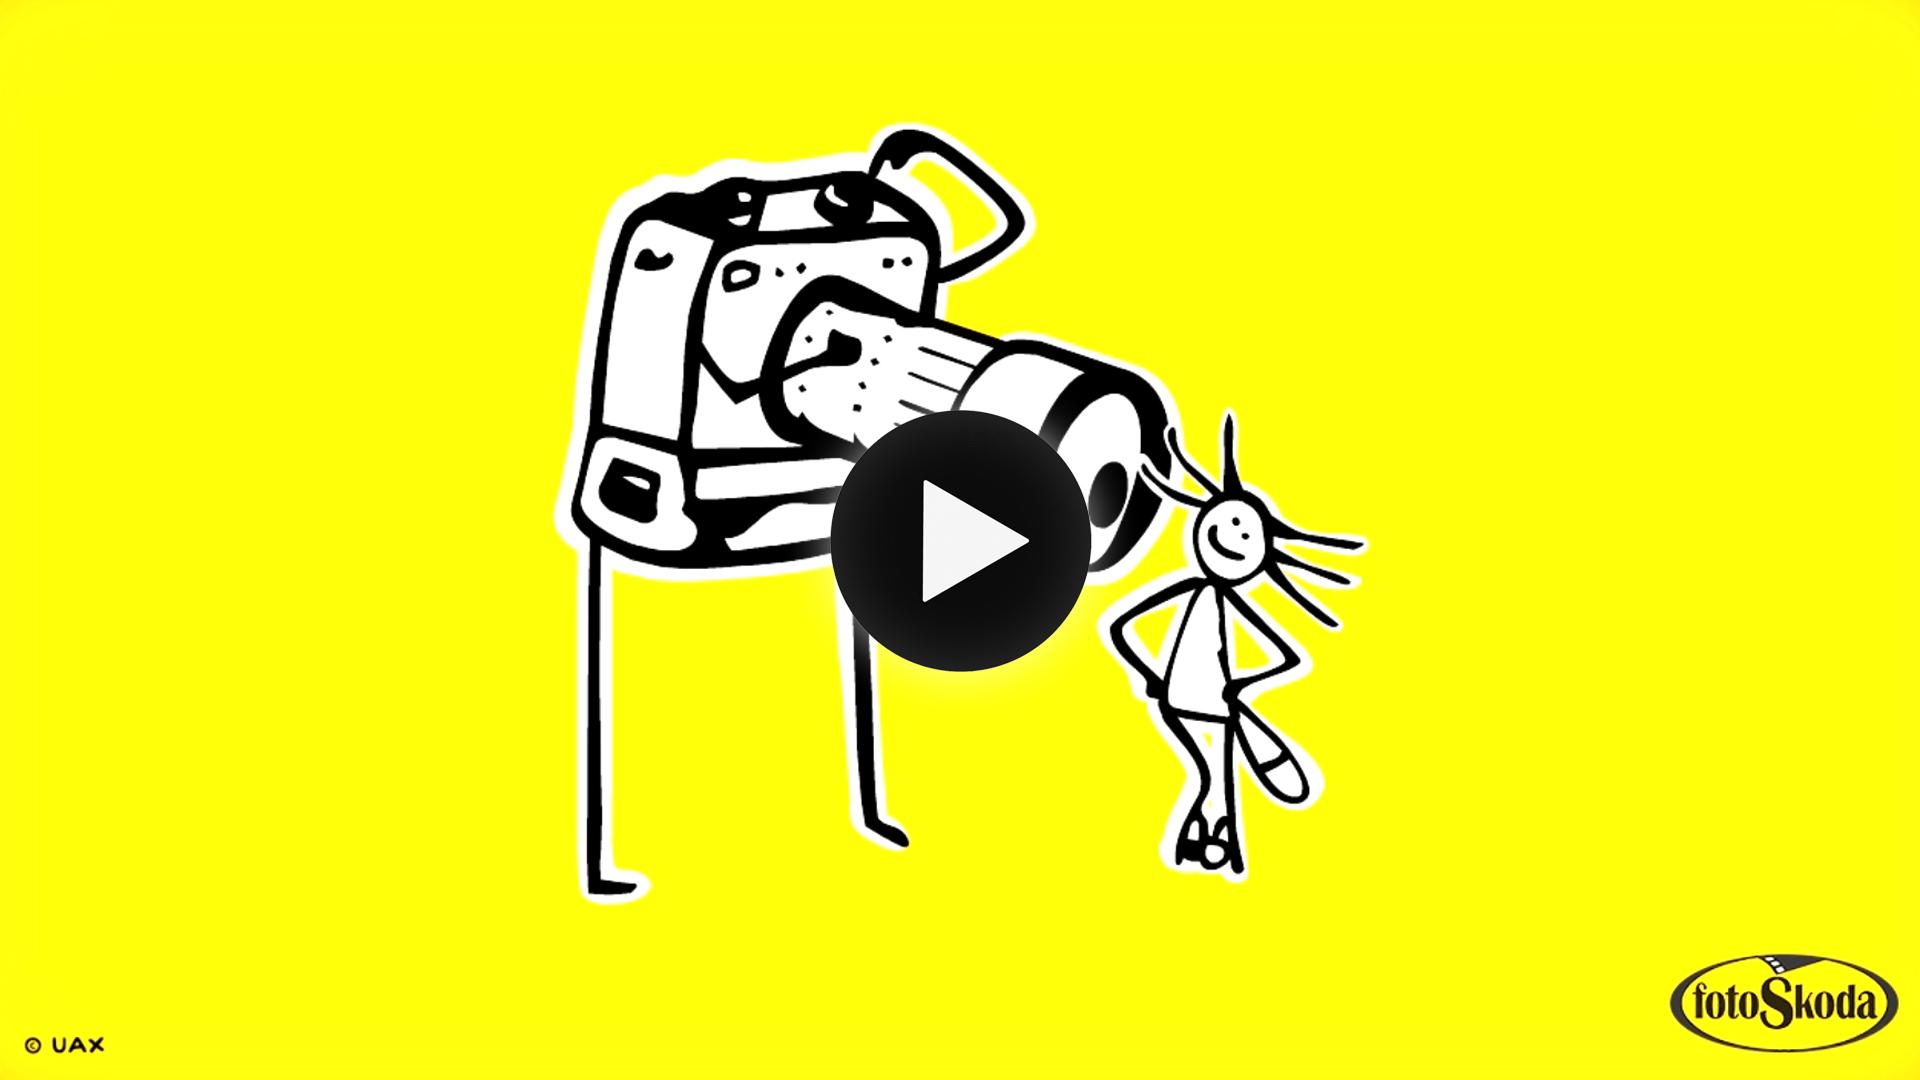 animace Fotoškoda